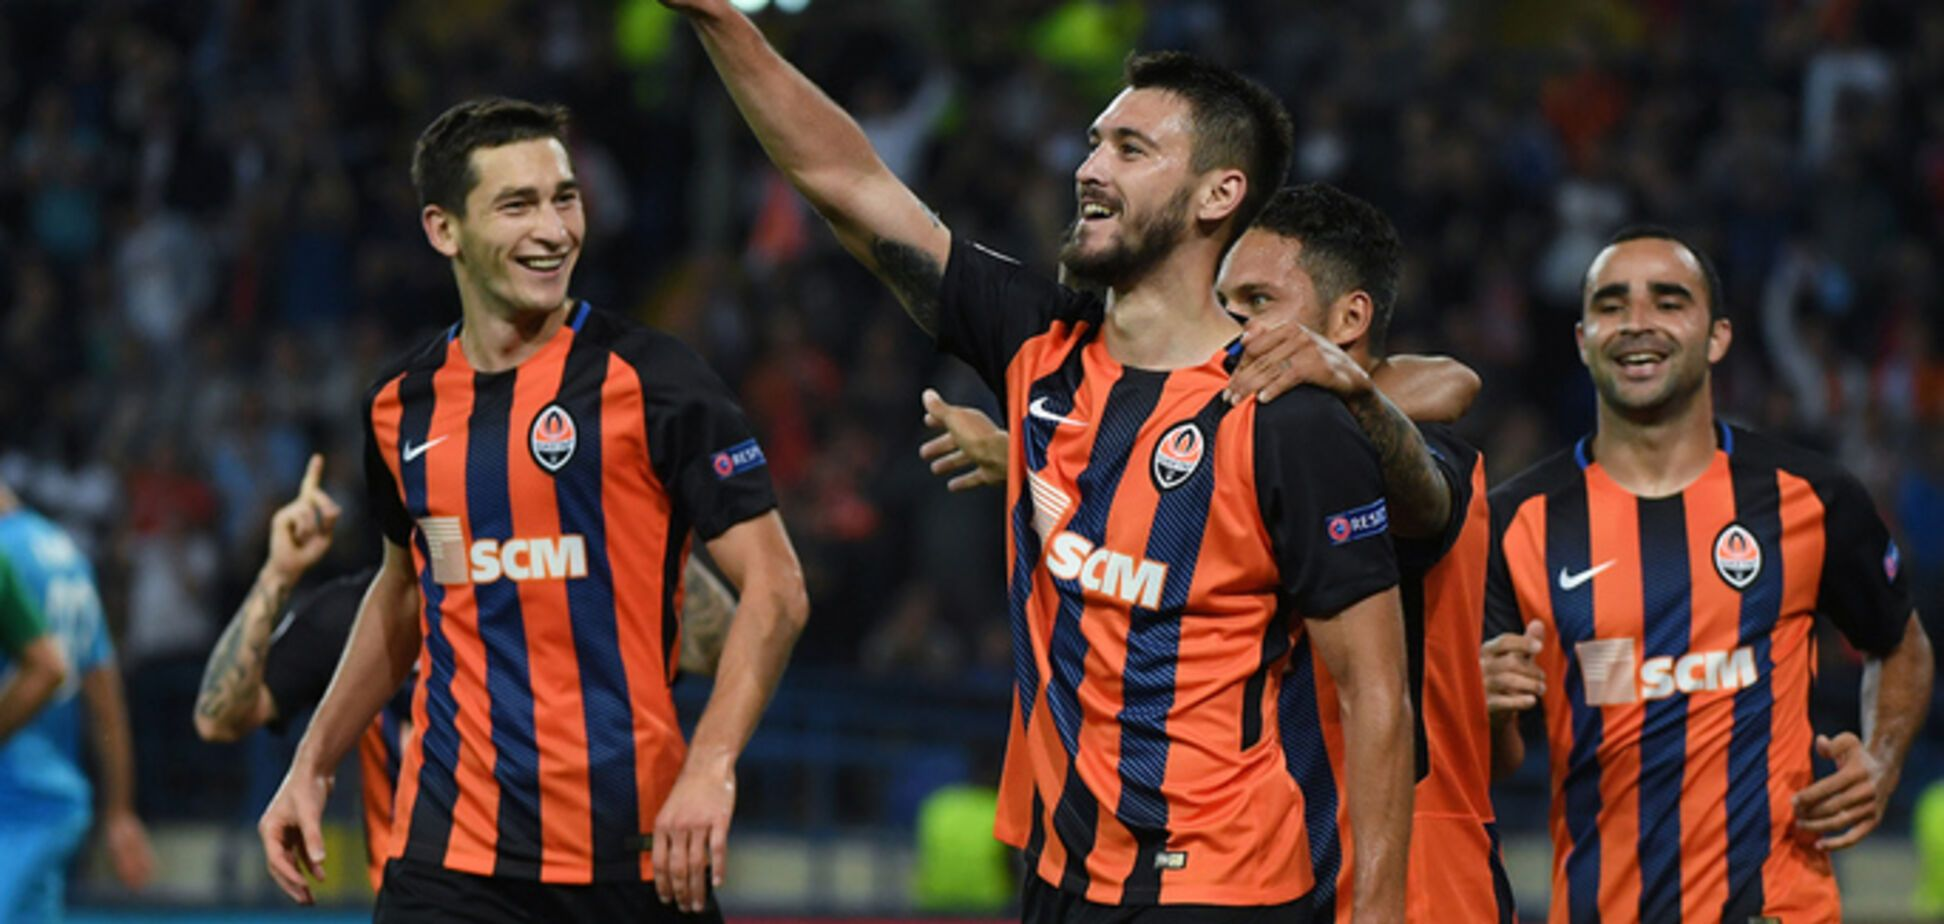 Шахтер - Рома: онлайн-трансляция матча 1/8 финала Лиги чемпионов